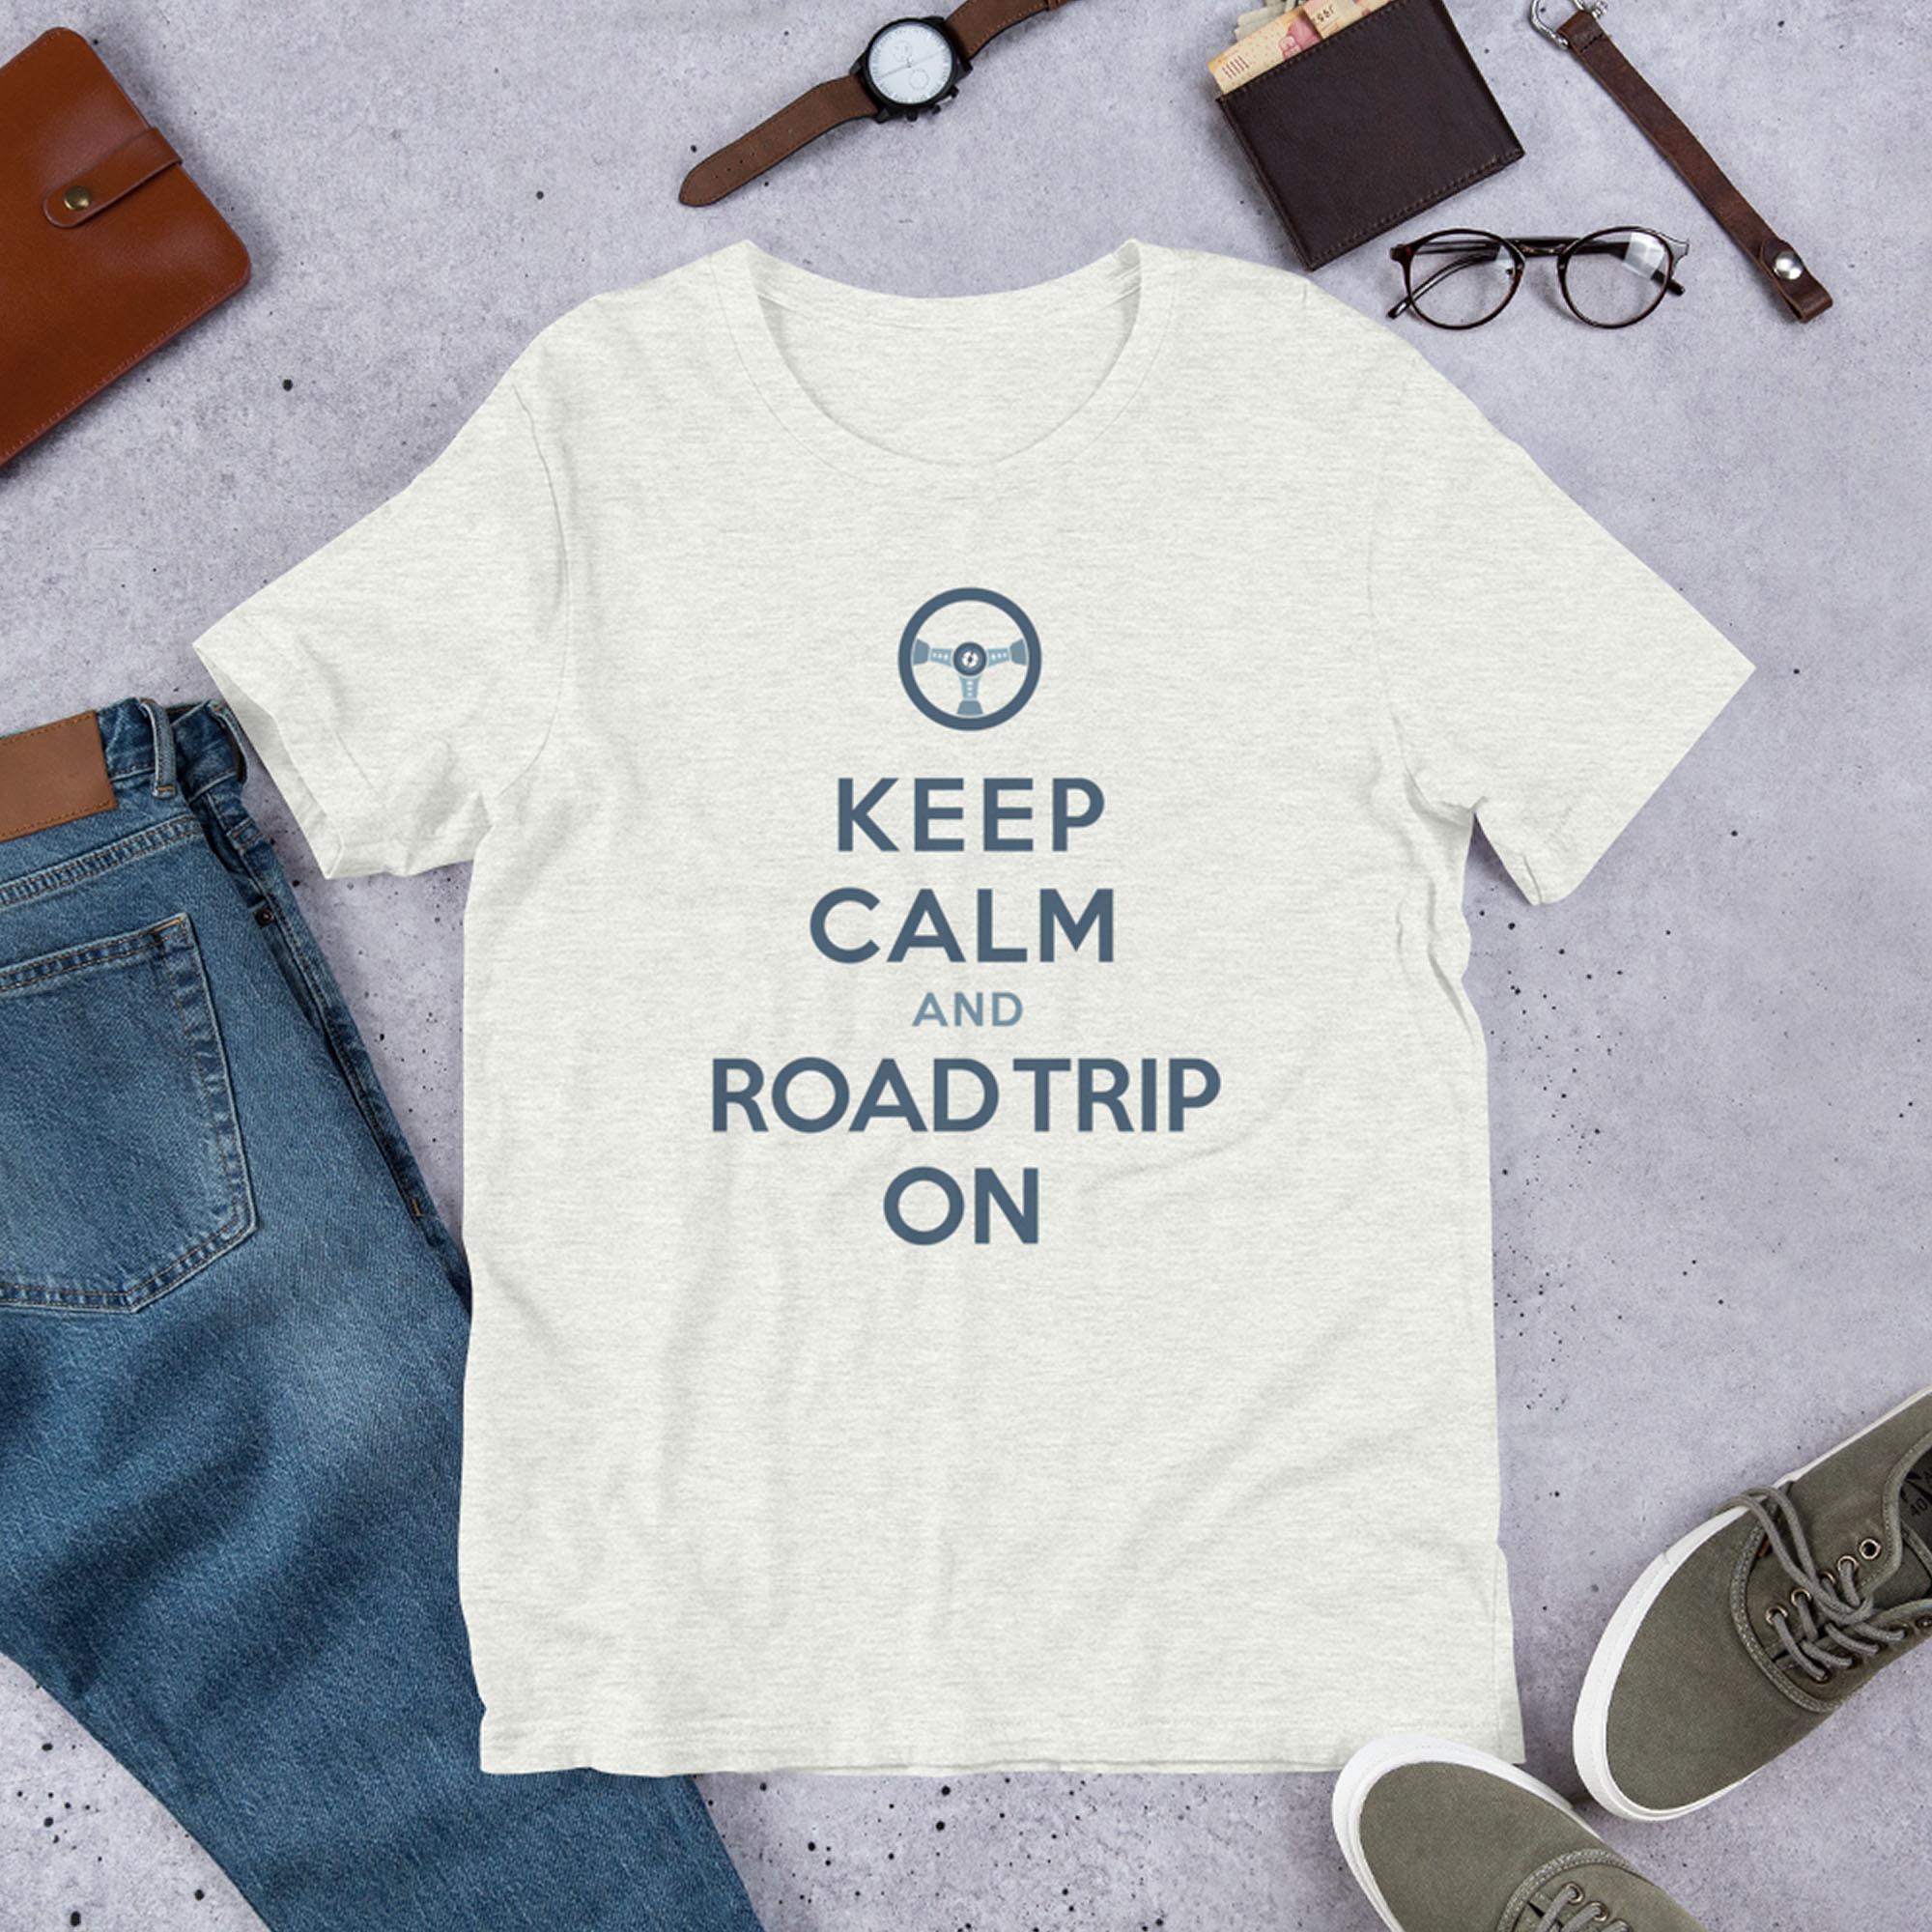 Road Trip Ontario - Adult Unisex T-Shirts